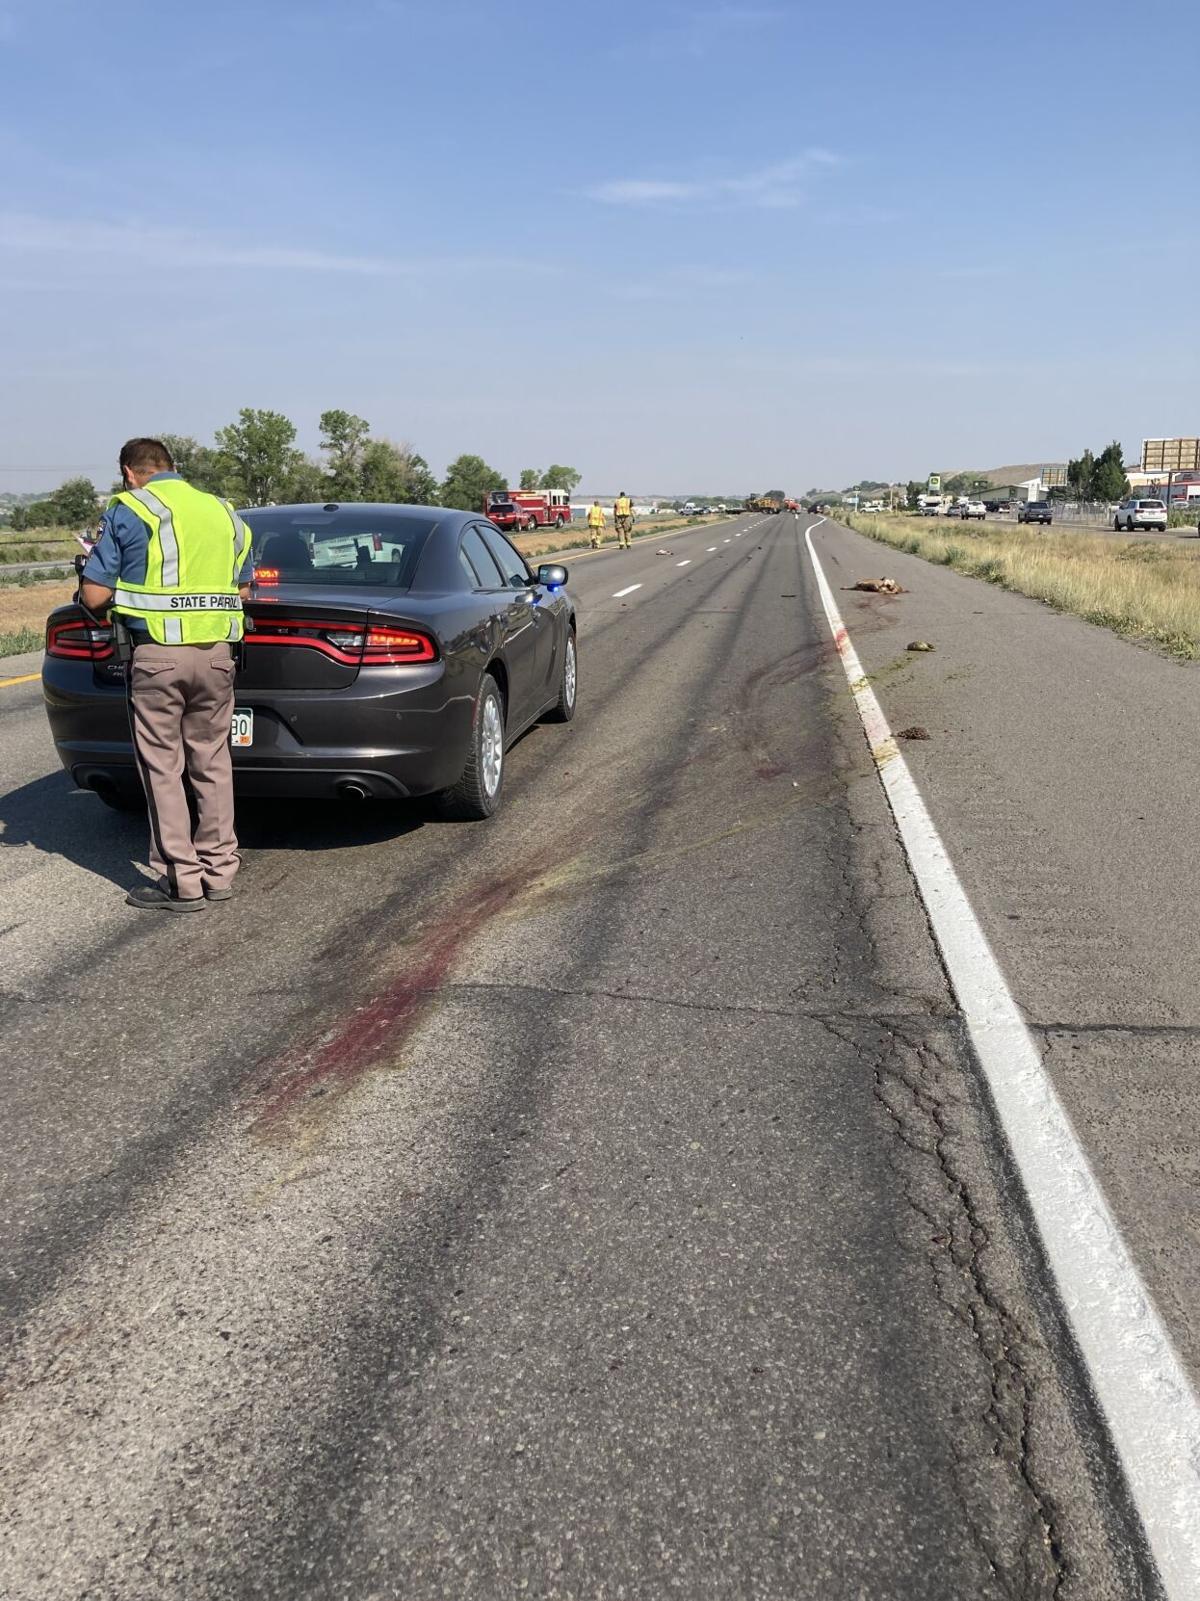 6/17/21 accident: deer blood